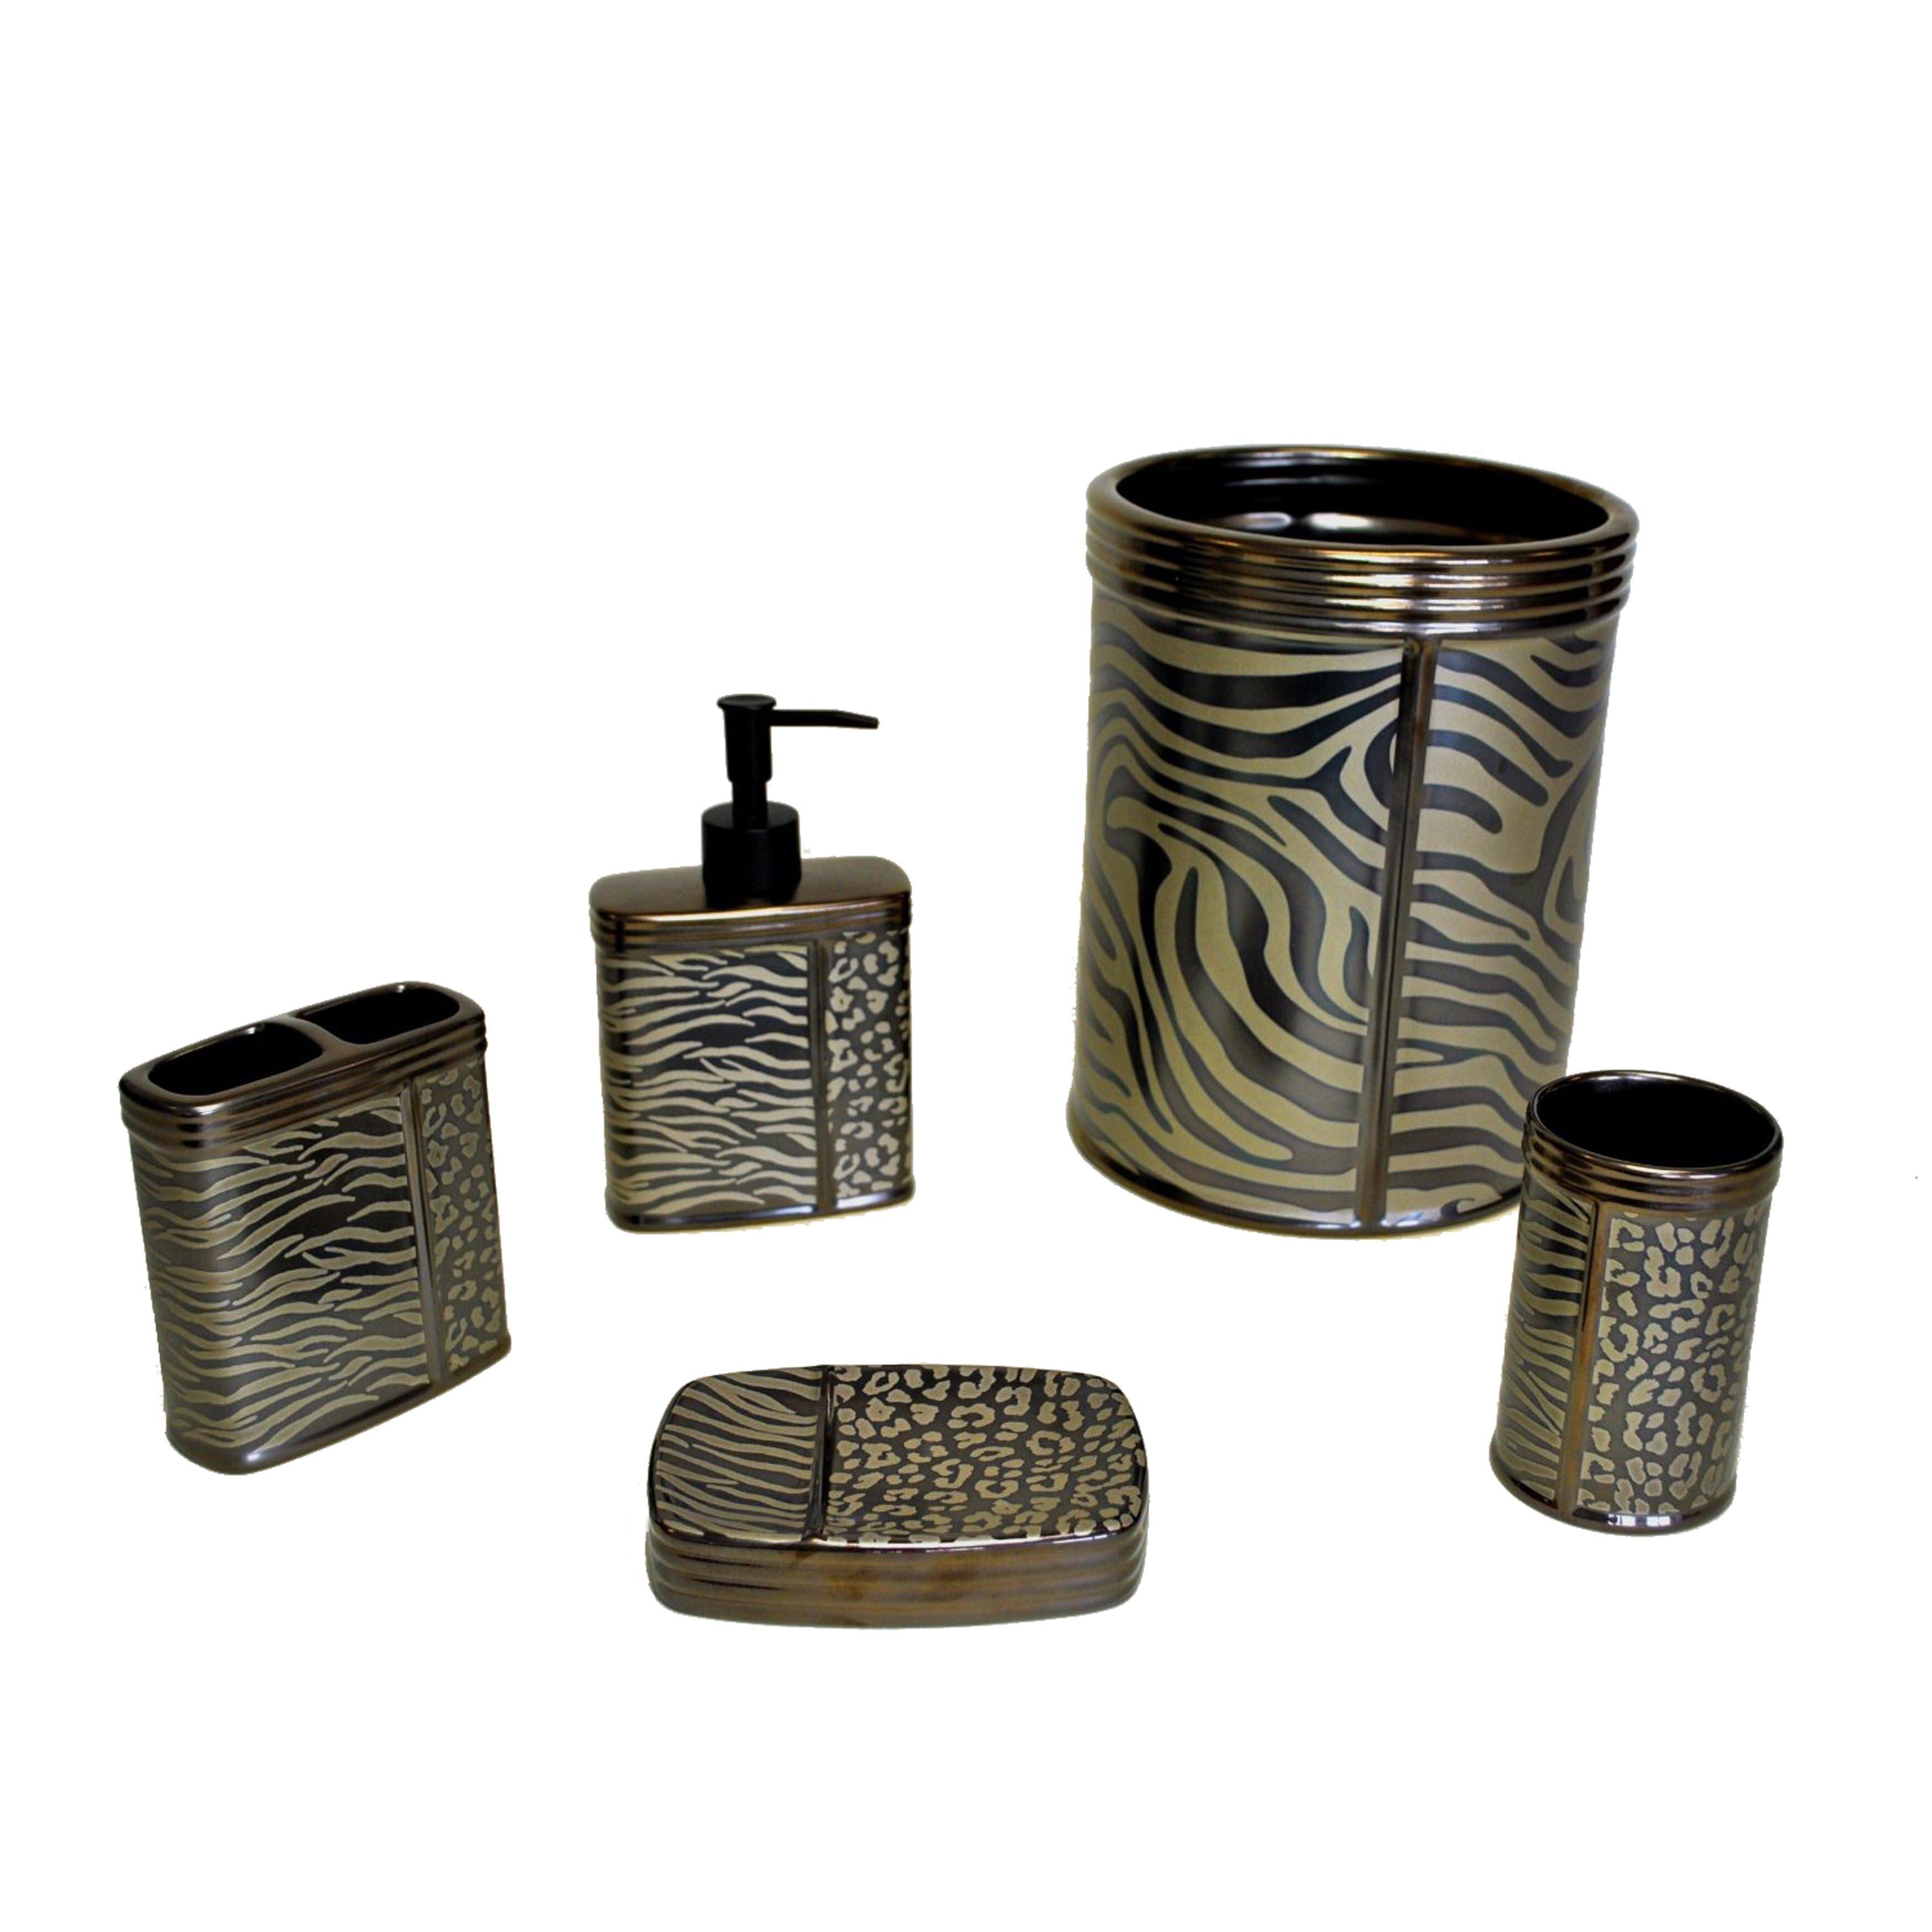 5 Bathroom Set Sherry Kline Zebra Print 5 Piece Bathroom Accessory Set